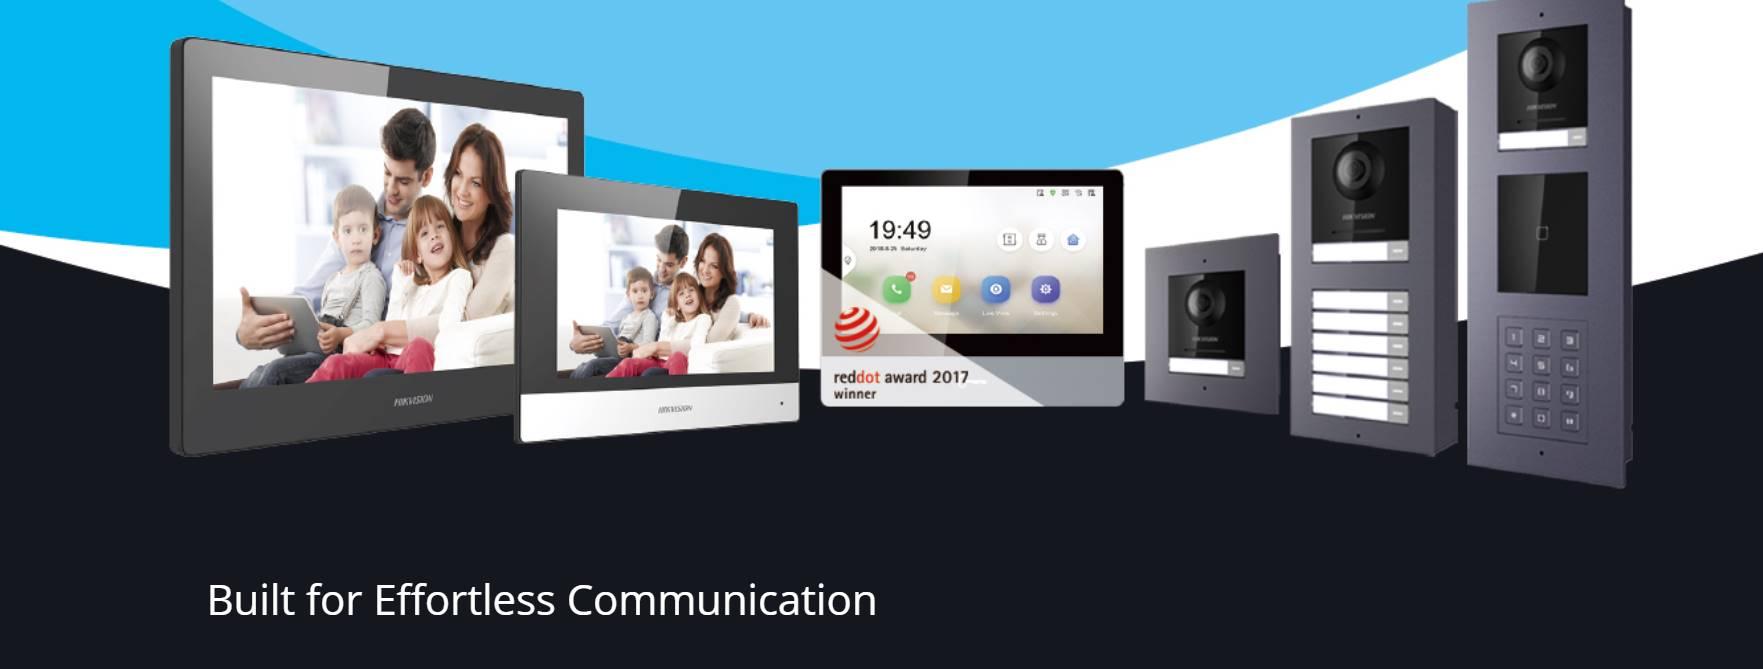 DS-KIS602 | IP Kits